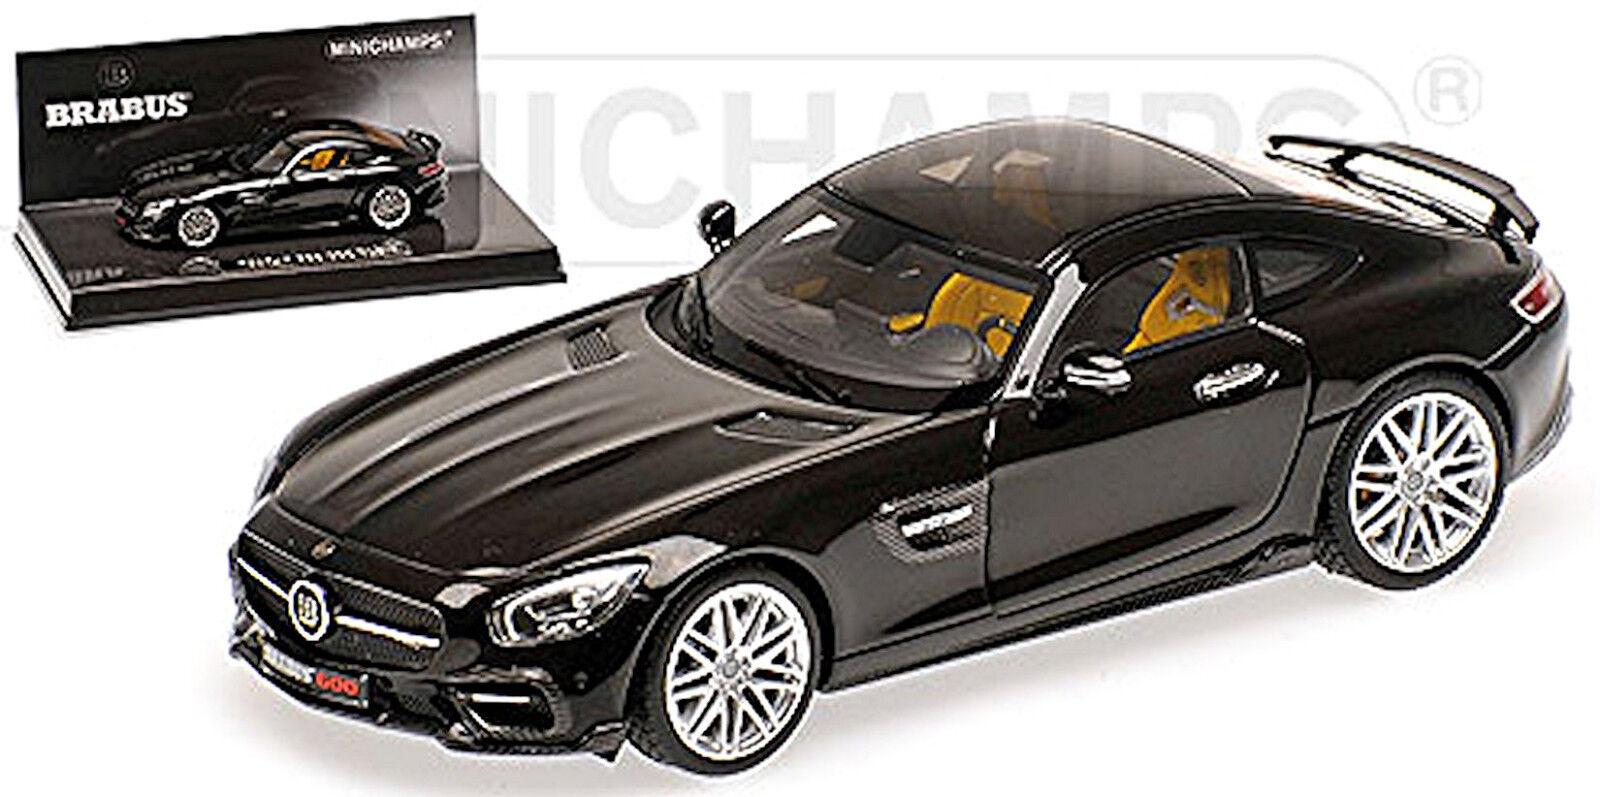 Brabus 600 Mercedes AMG GT S 2016 L.E.500 Pz black 1 43 Minichamps